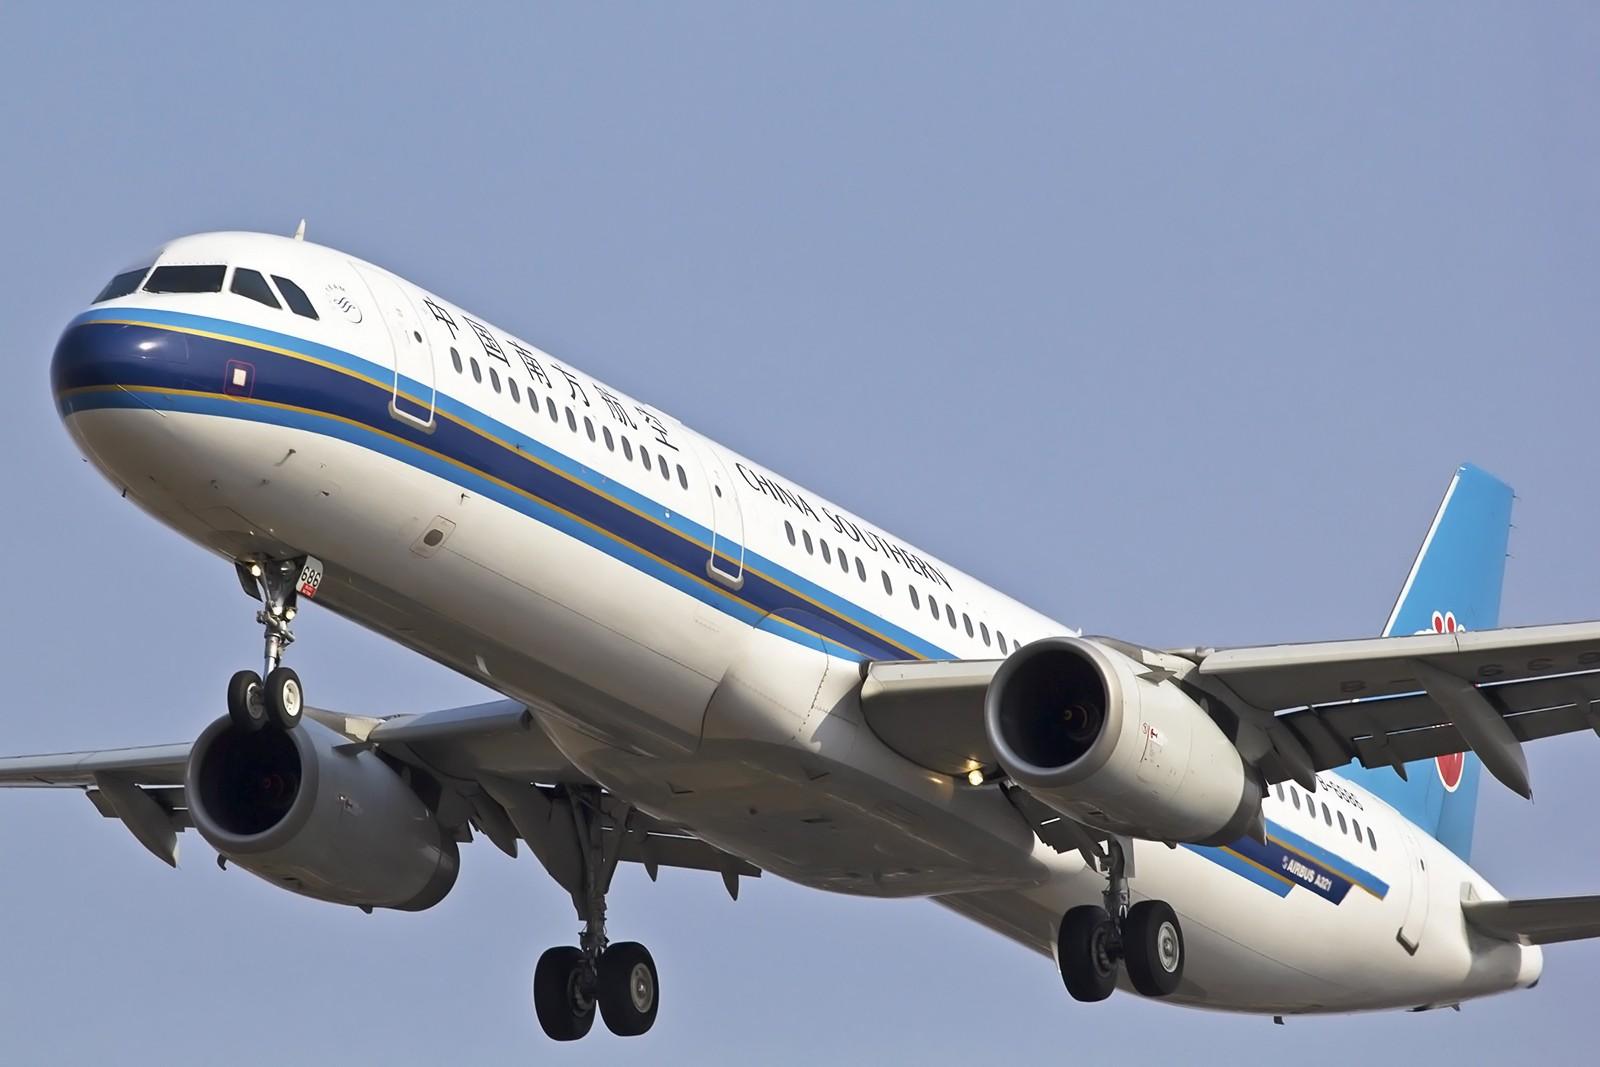 Re:[原创]2015年2月持续贴 AIRBUS A321-200 B-6686 中国大连周水子国际机场